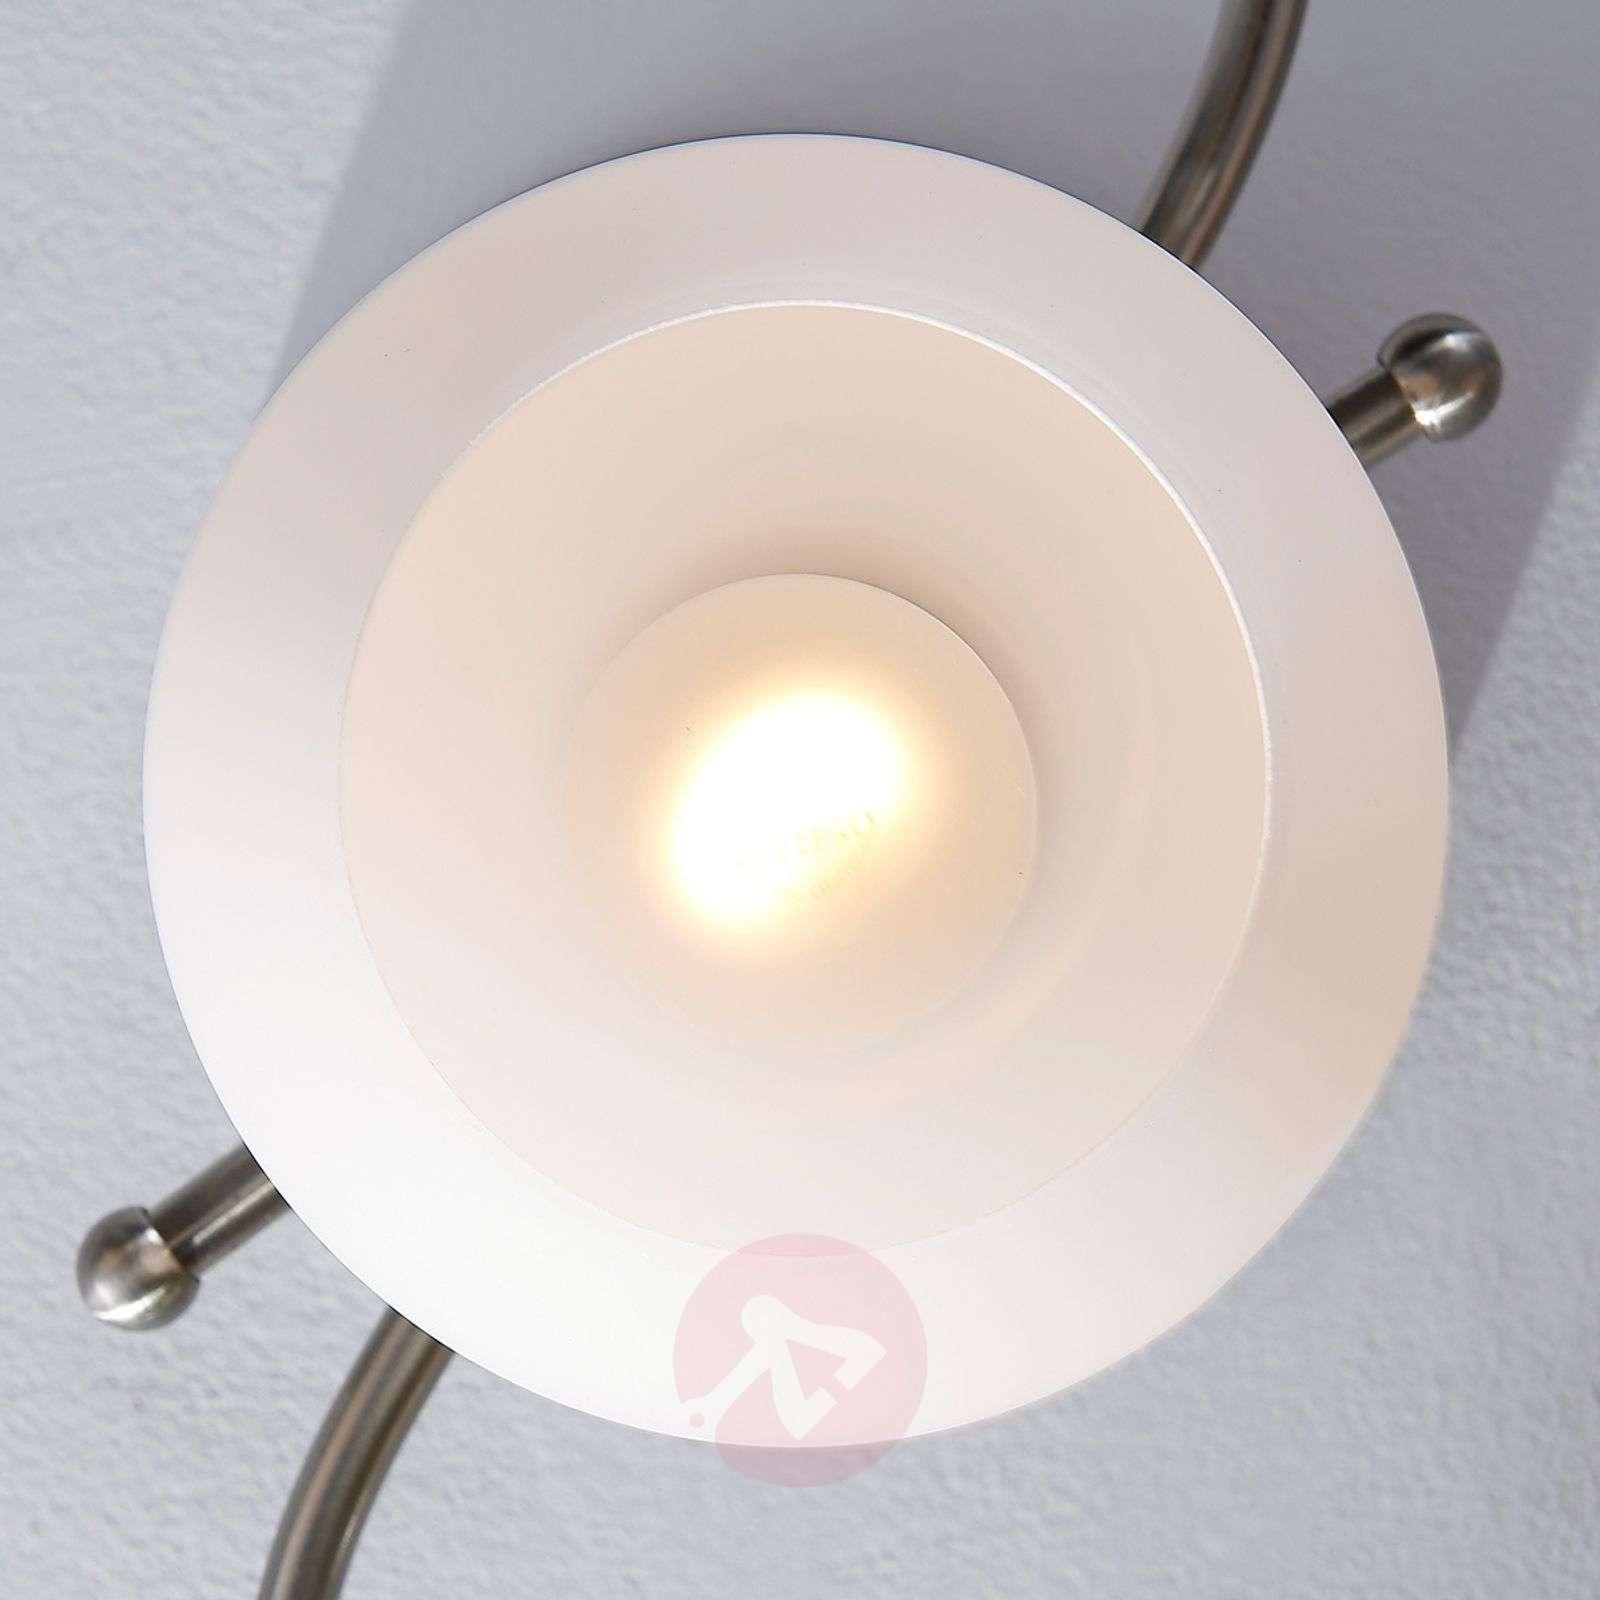 Svean 3-bulb ceiling lamp-9620764-01